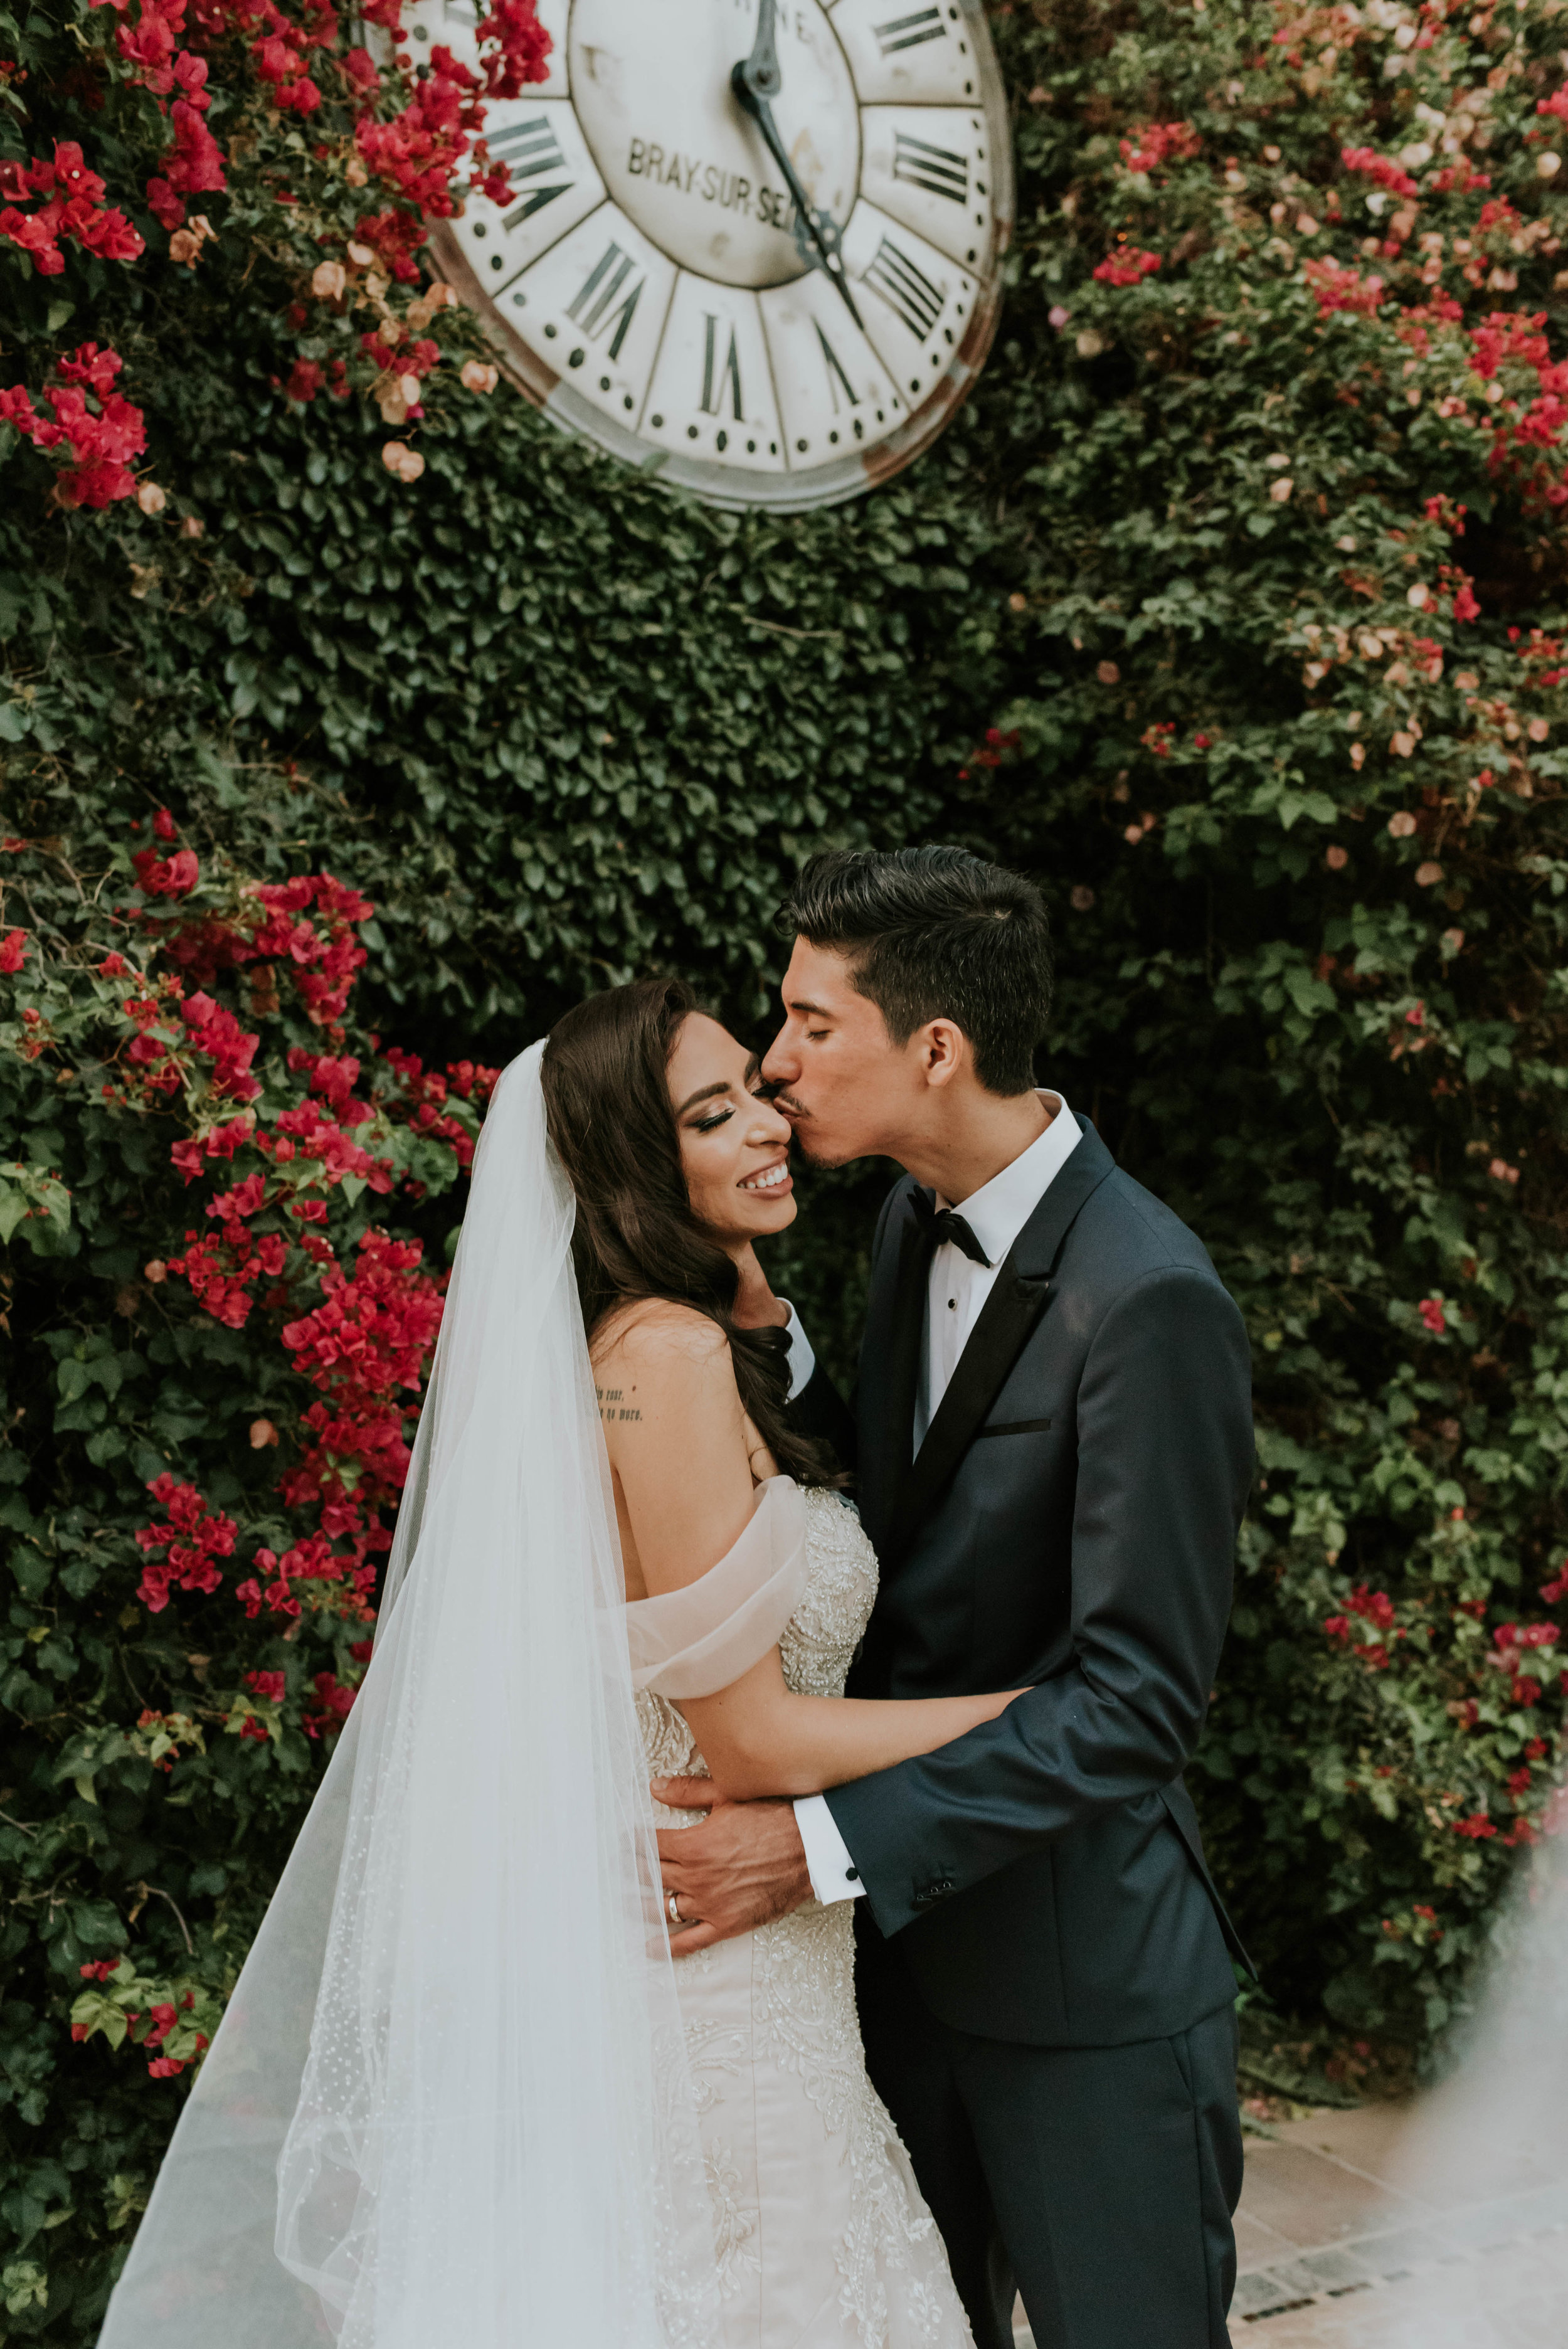 Houdini Estate Wedding - Los Angeles  Angie + lsmael